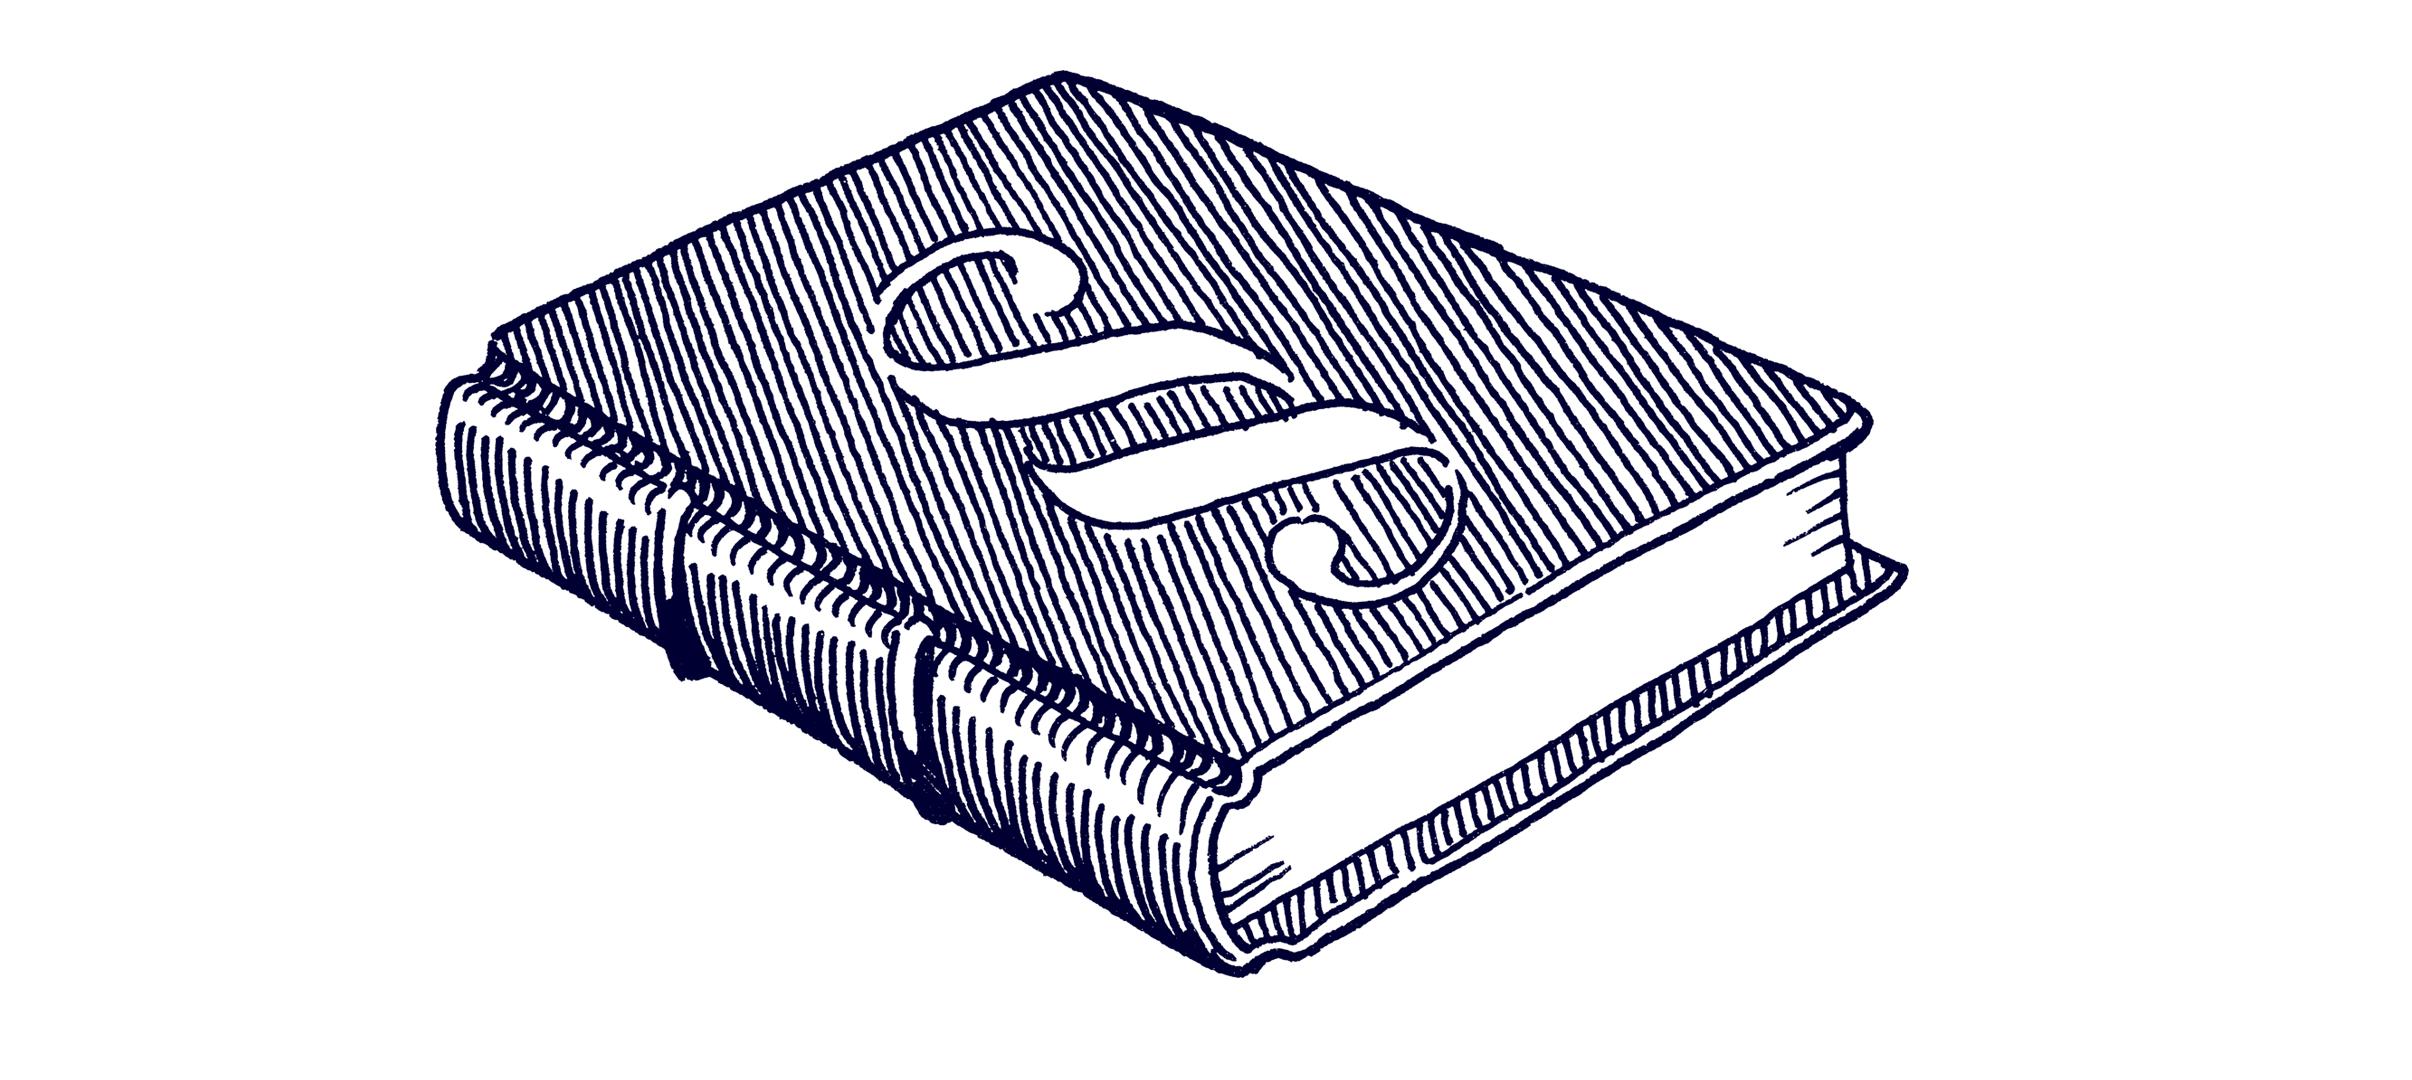 Sujet JuristInnen | Haslinger / Nagele, Illustration: Karl-Heinz Wasserbacher